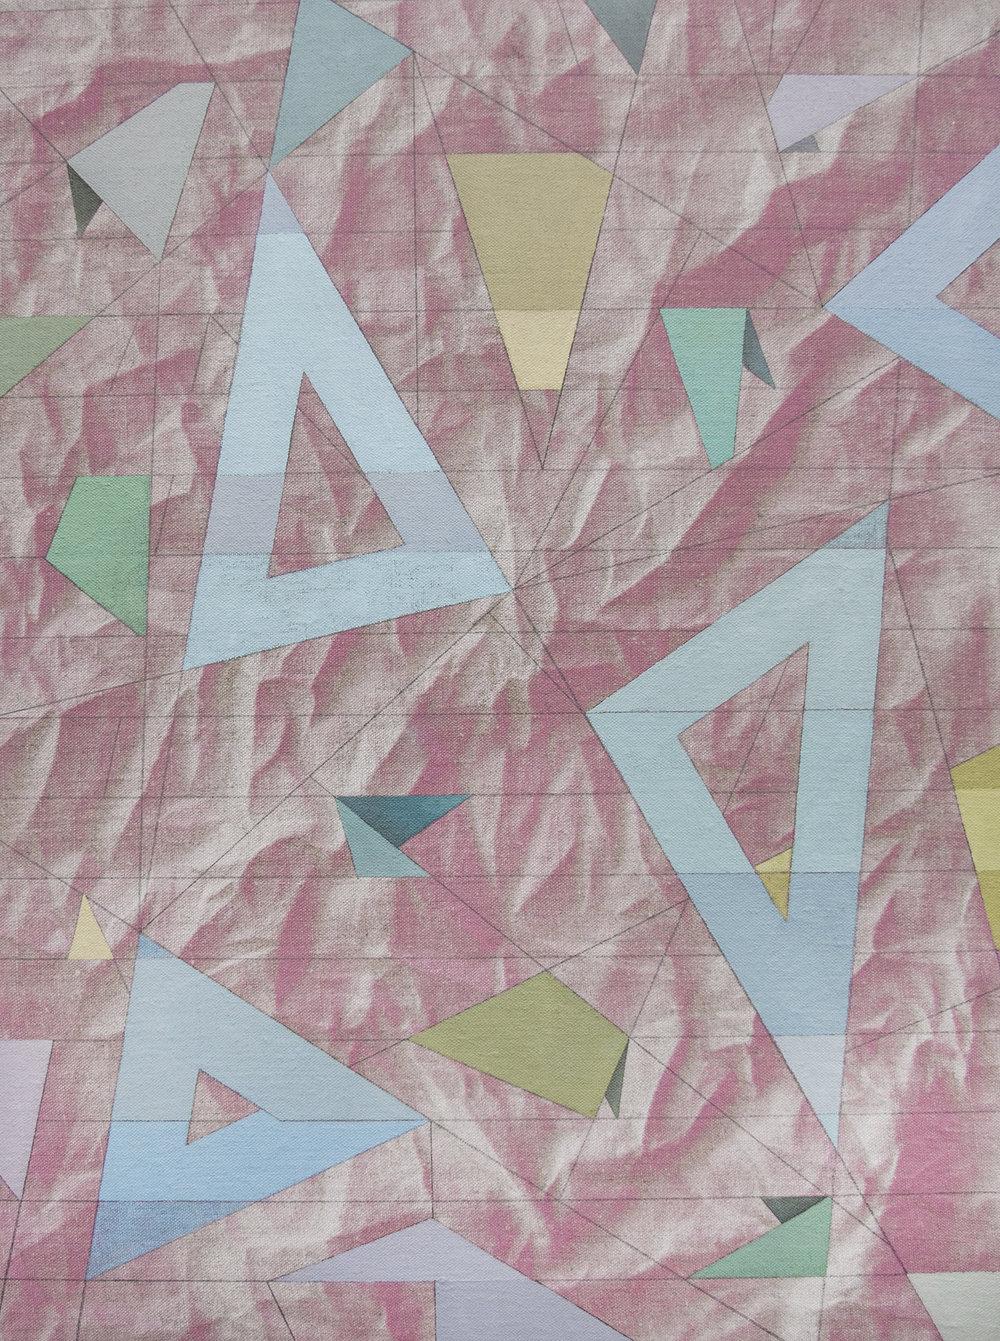 "constellation atlas, 18"" x 24"", oil, wax, acrylic + graphite on linen, 2016"